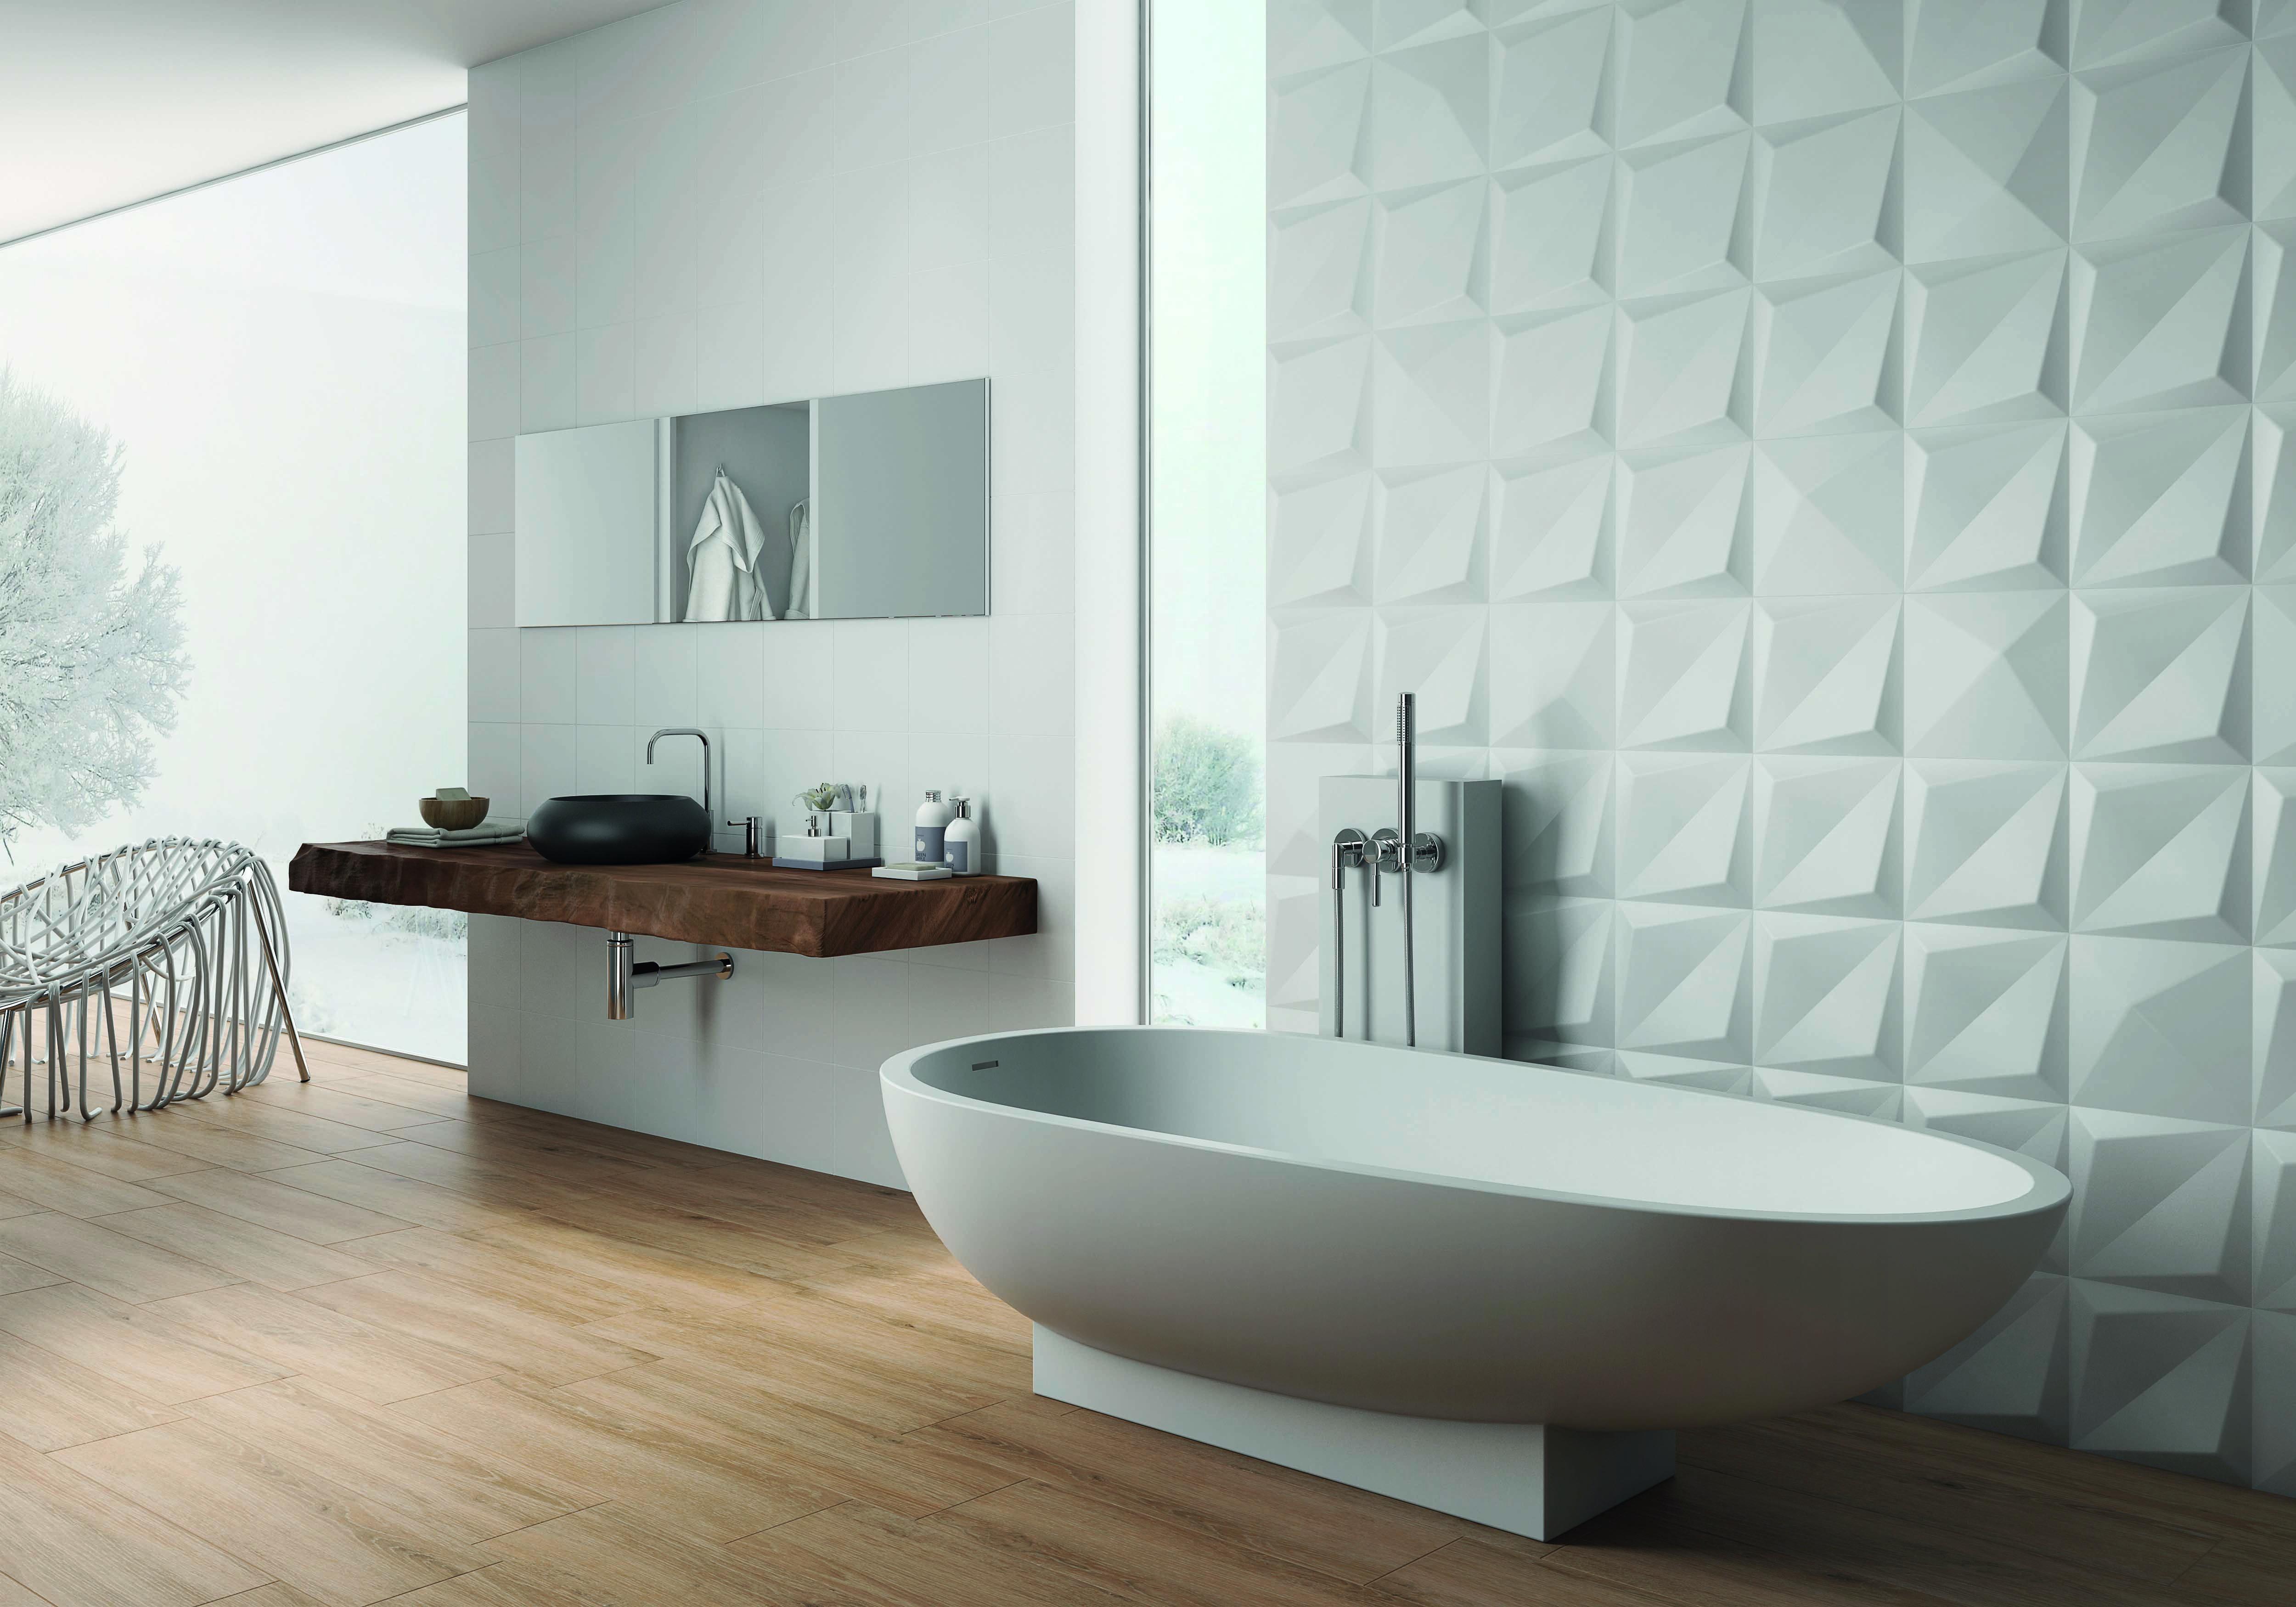 du wall shapes origami white matt25x25cm  white bathroom